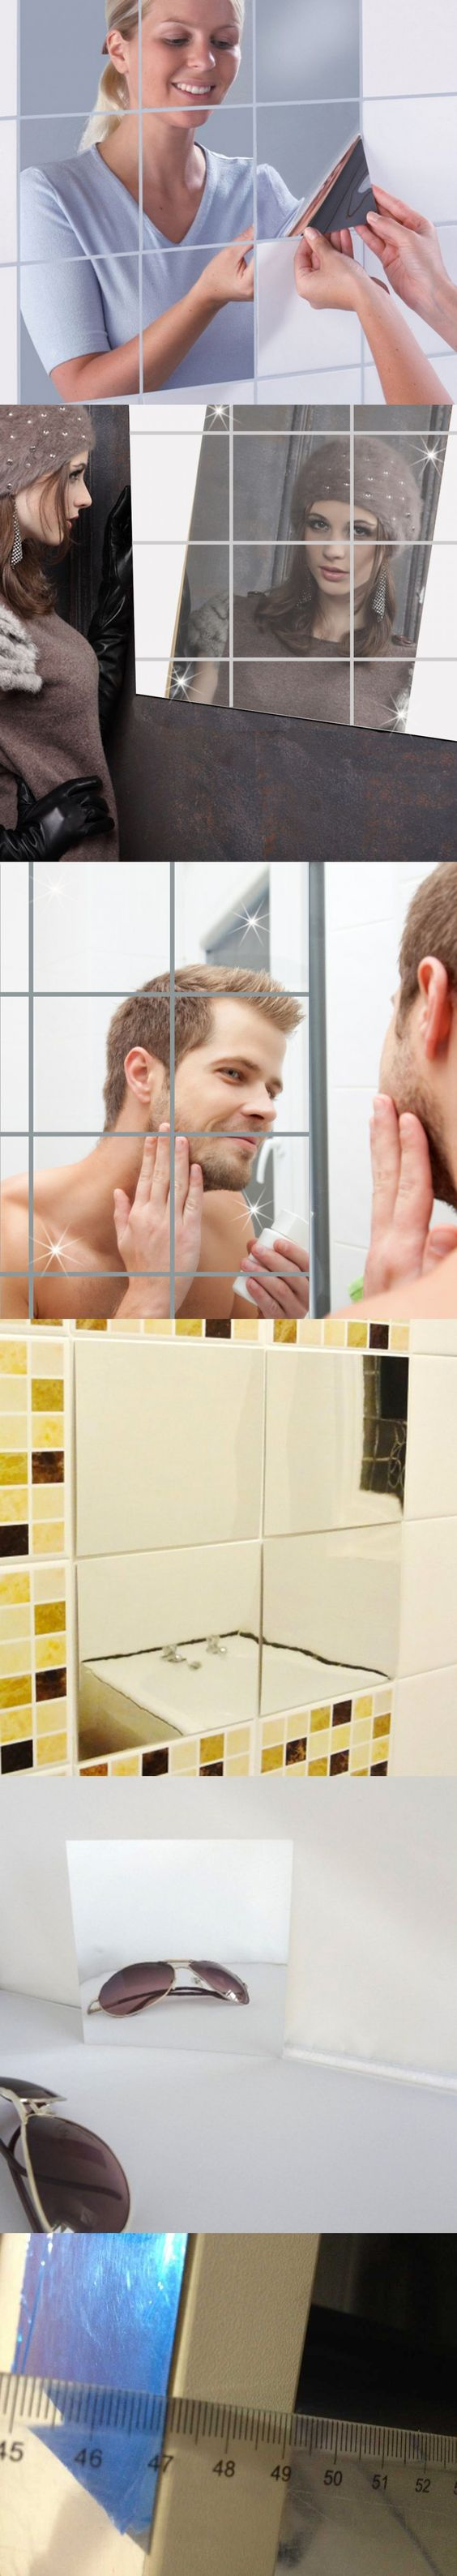 16pcs / set 15cm square movable mirror mirror creative home decoration combination stickers $9.99